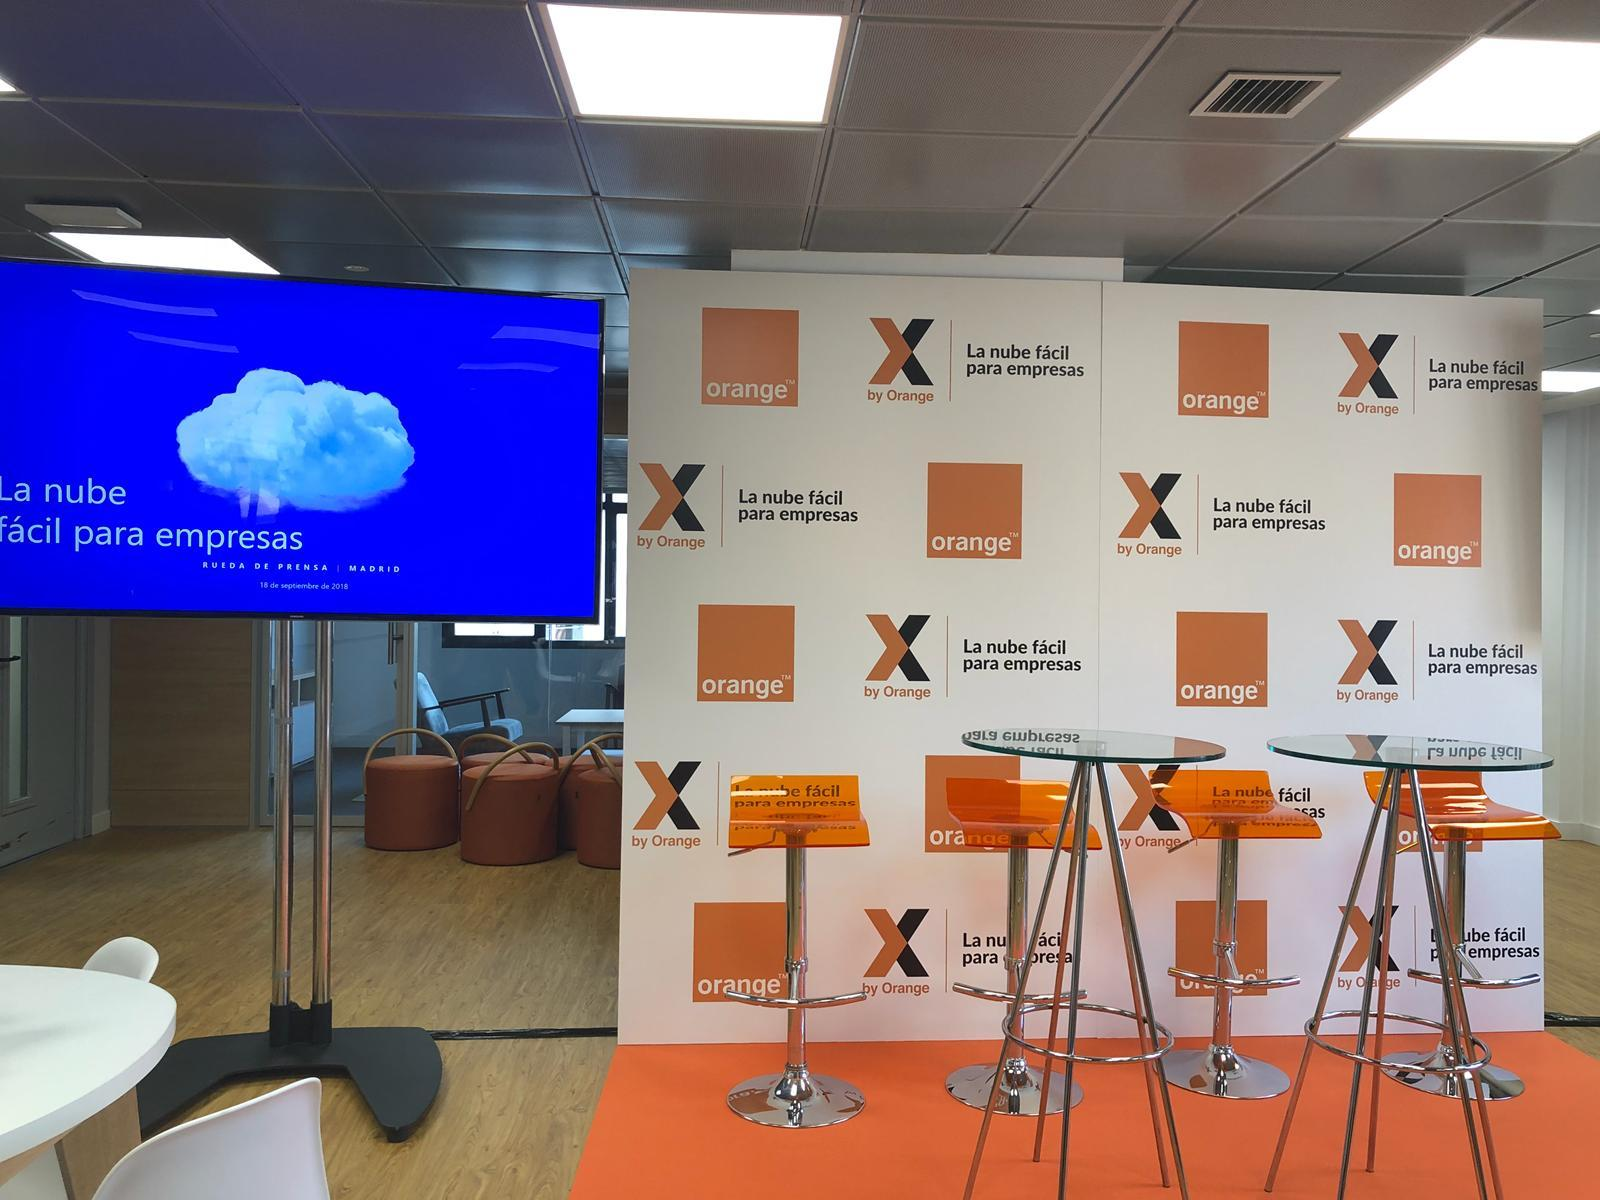 x by Orange